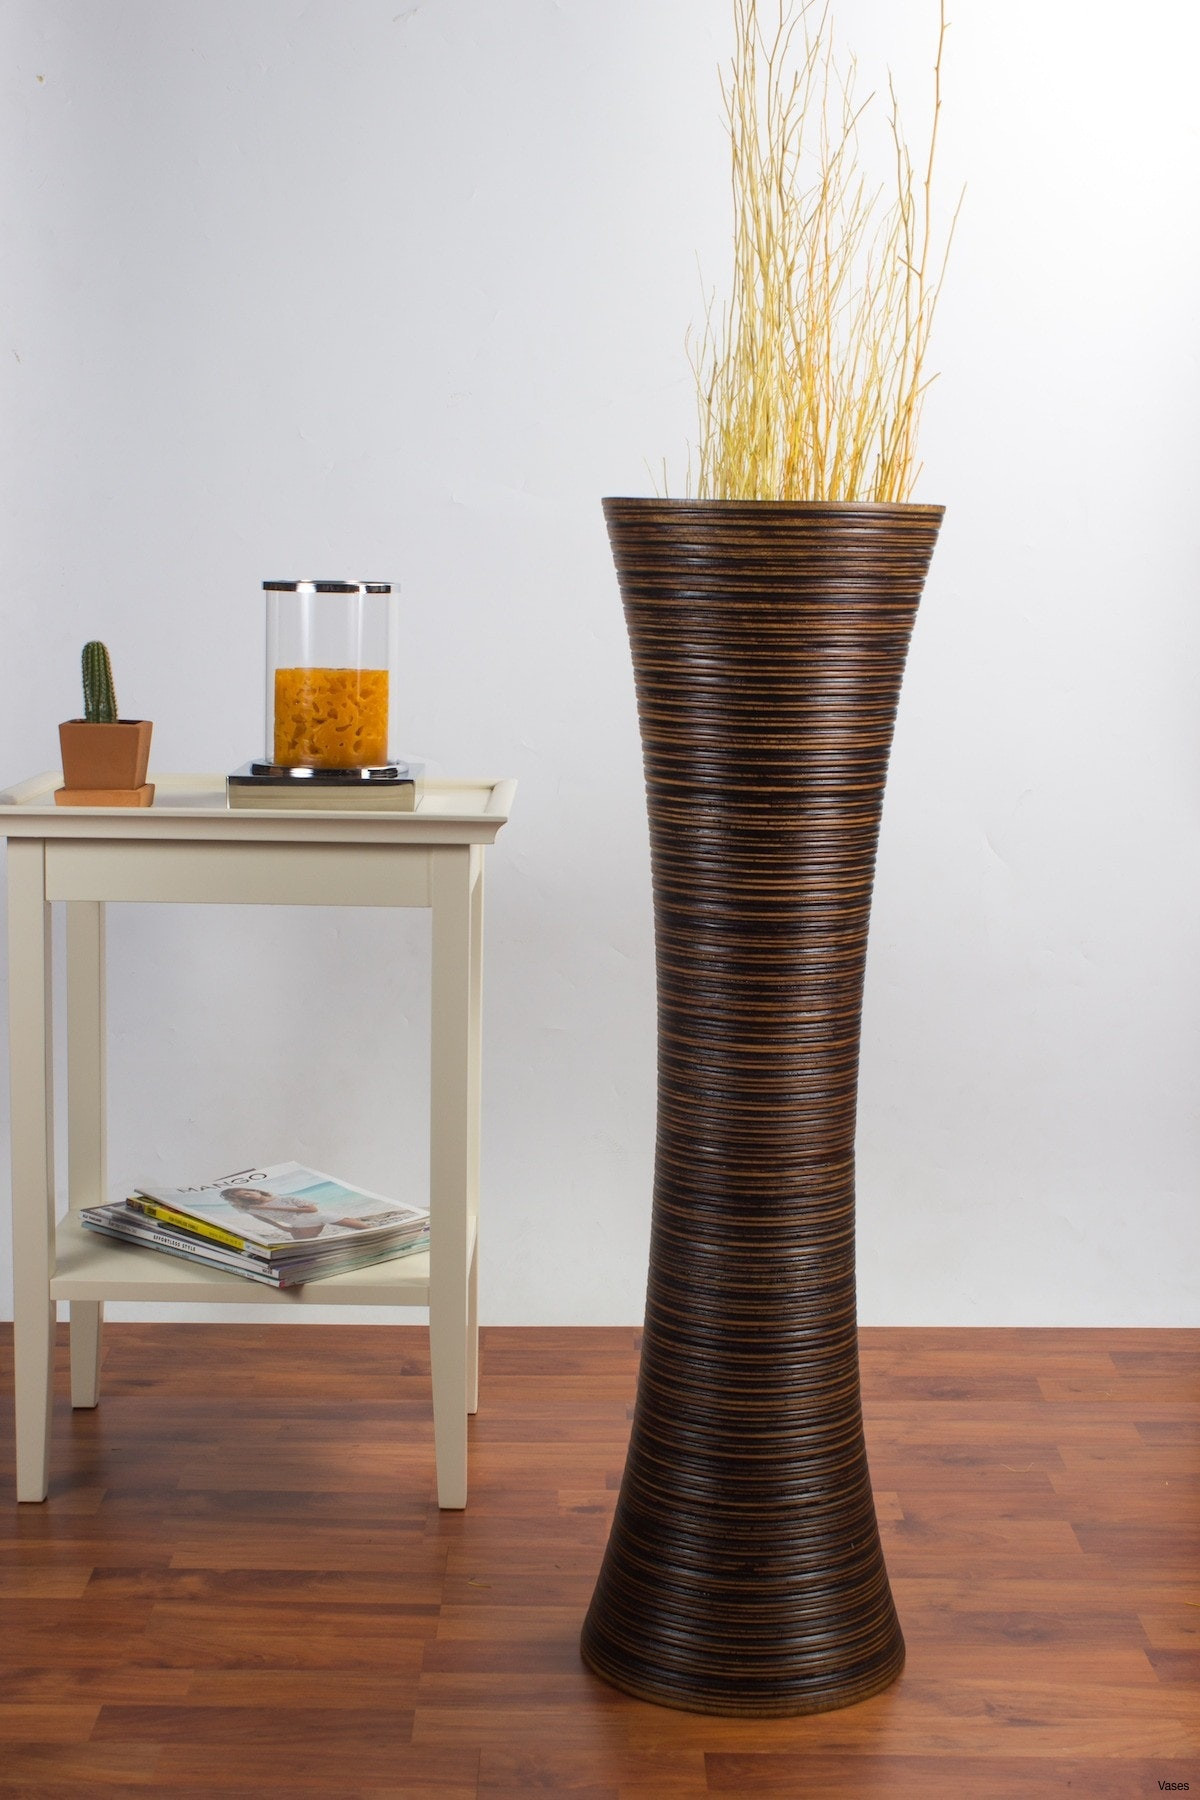 cheap copper vases of 20 unique very tall decorative vases bogekompresorturkiye com for decorative floor vases fresh d dkbrw 5749 1h vases tall brown i 0d design ideas